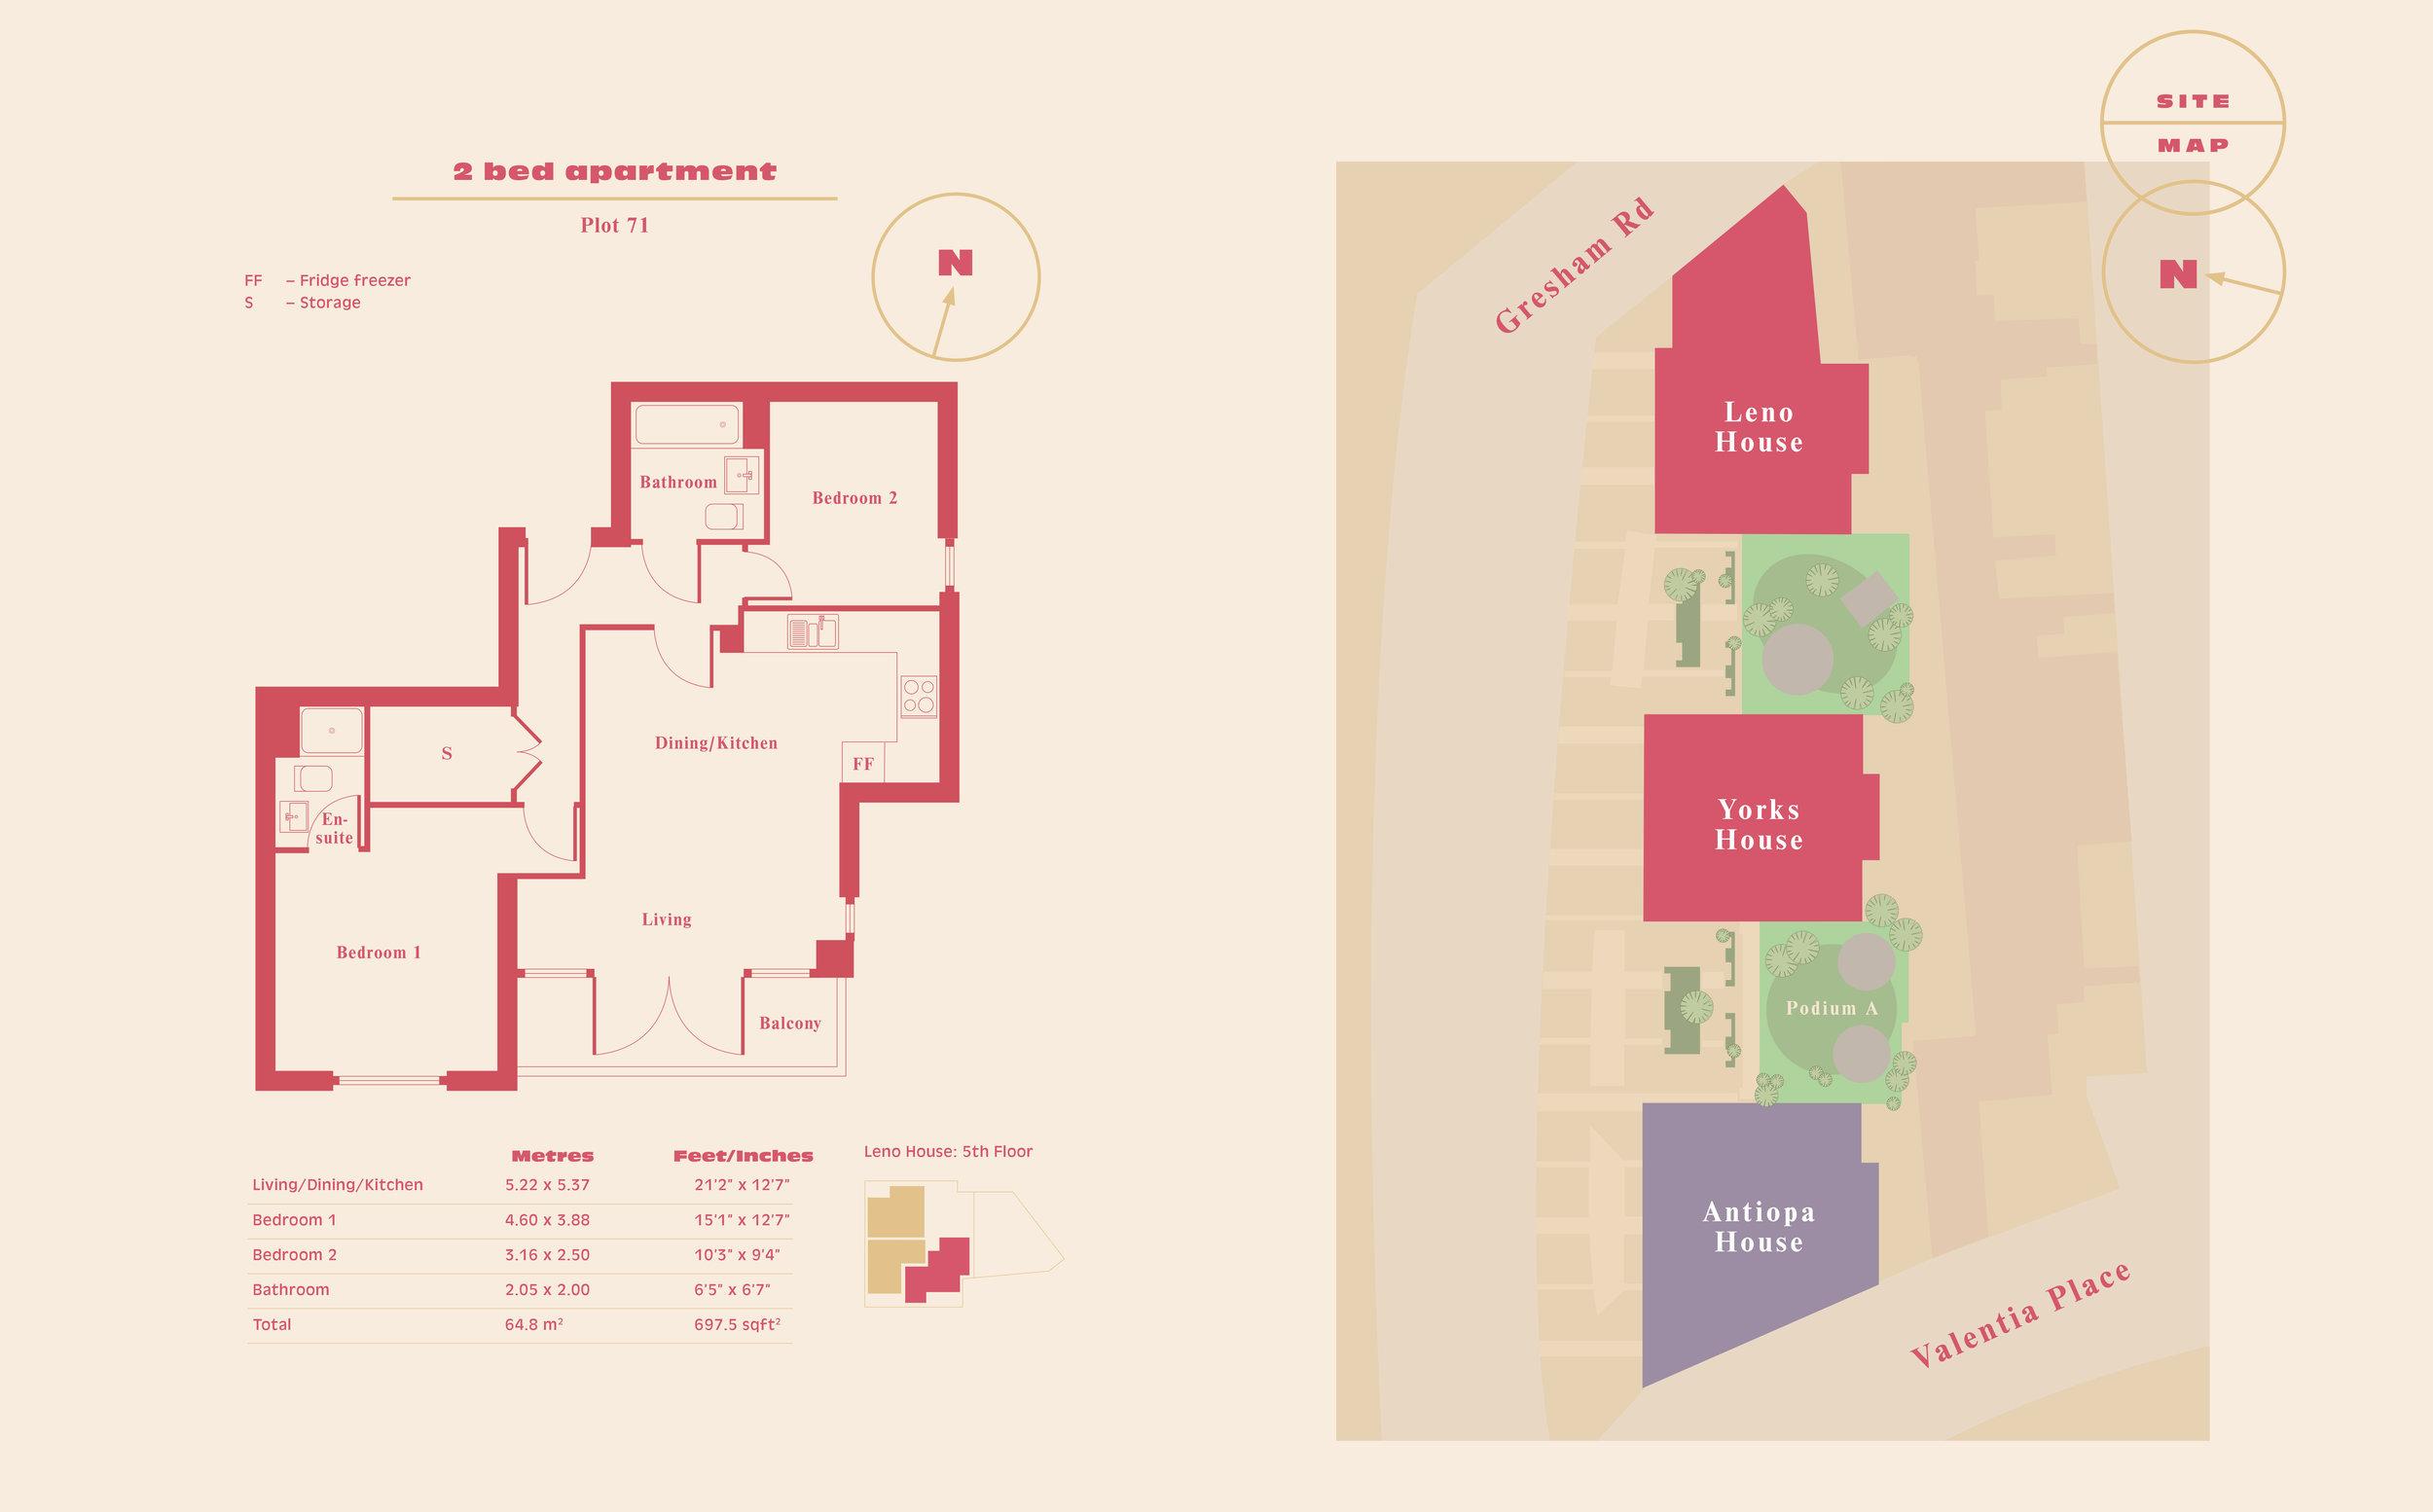 Depot floorplan and sitemap.jpg